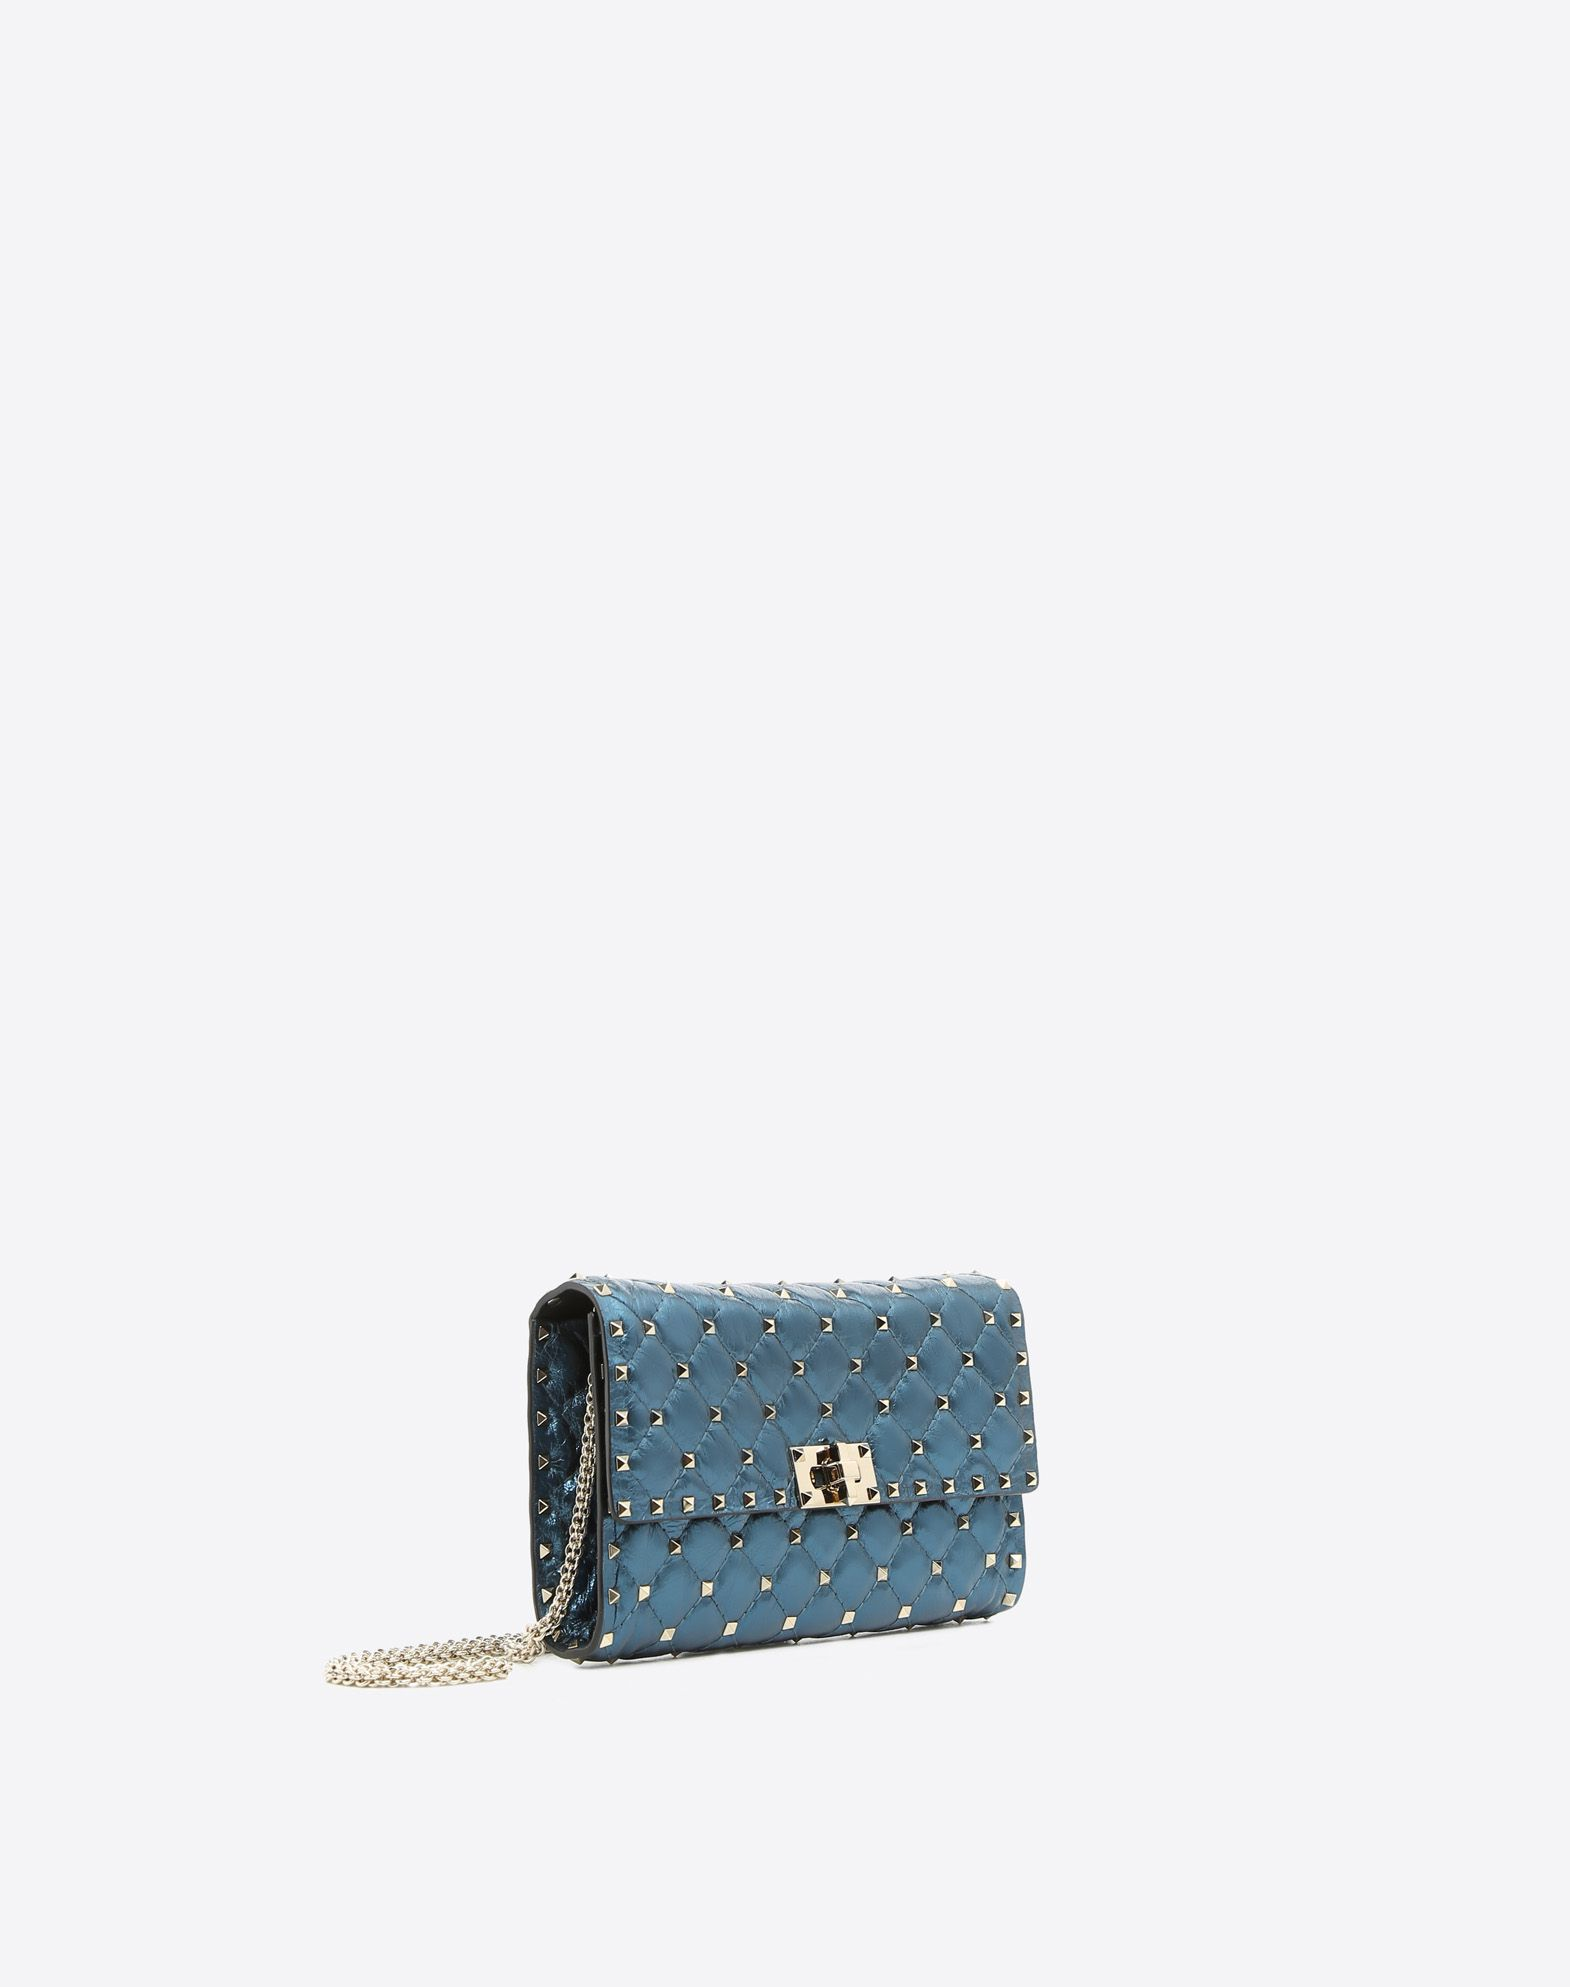 Rockstud Spike chain bag - Metallic Valentino Comfortable Cheap Online EDMZbo